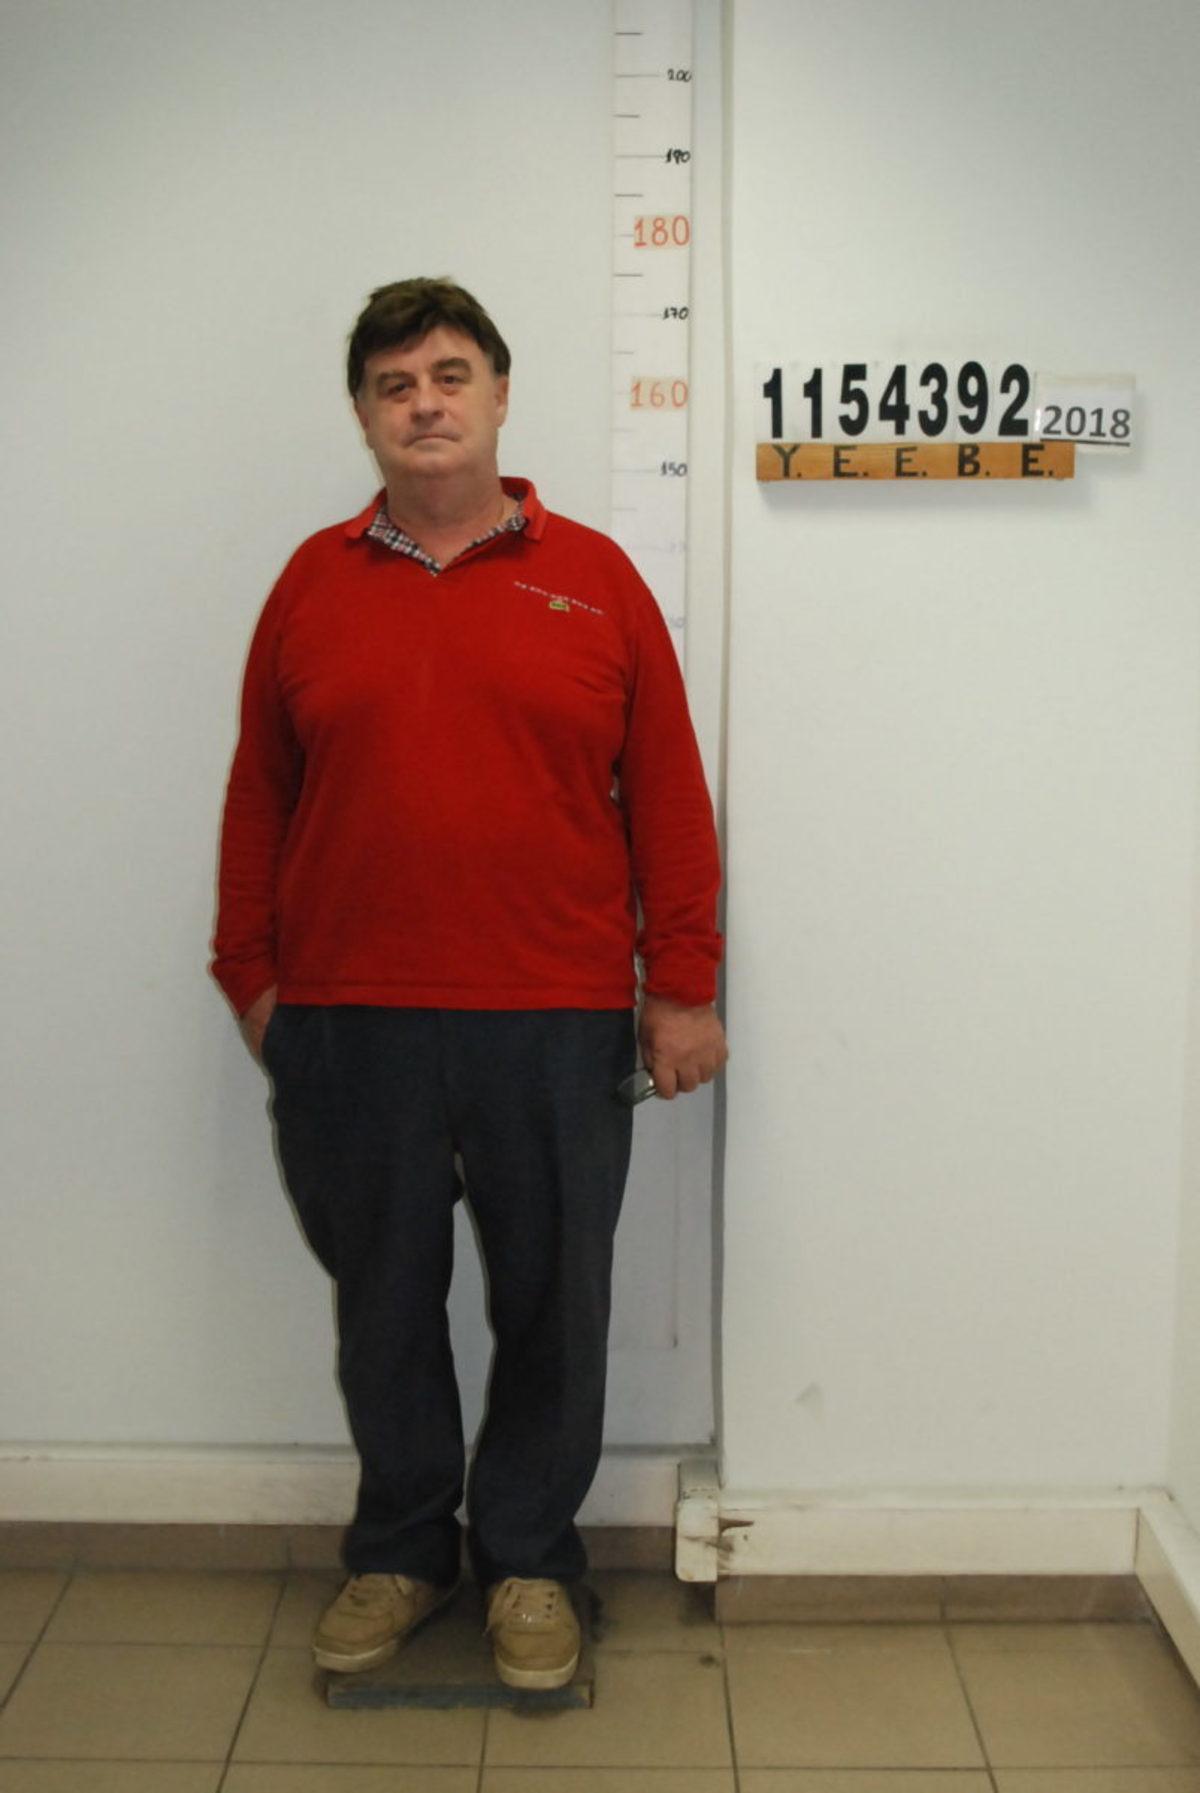 se2 - Αυτός είναι ο καθηγητής «Φακελάκης» στις Σέρρες – Φωτογραφίες και των φερόμενων ως συνεργών του